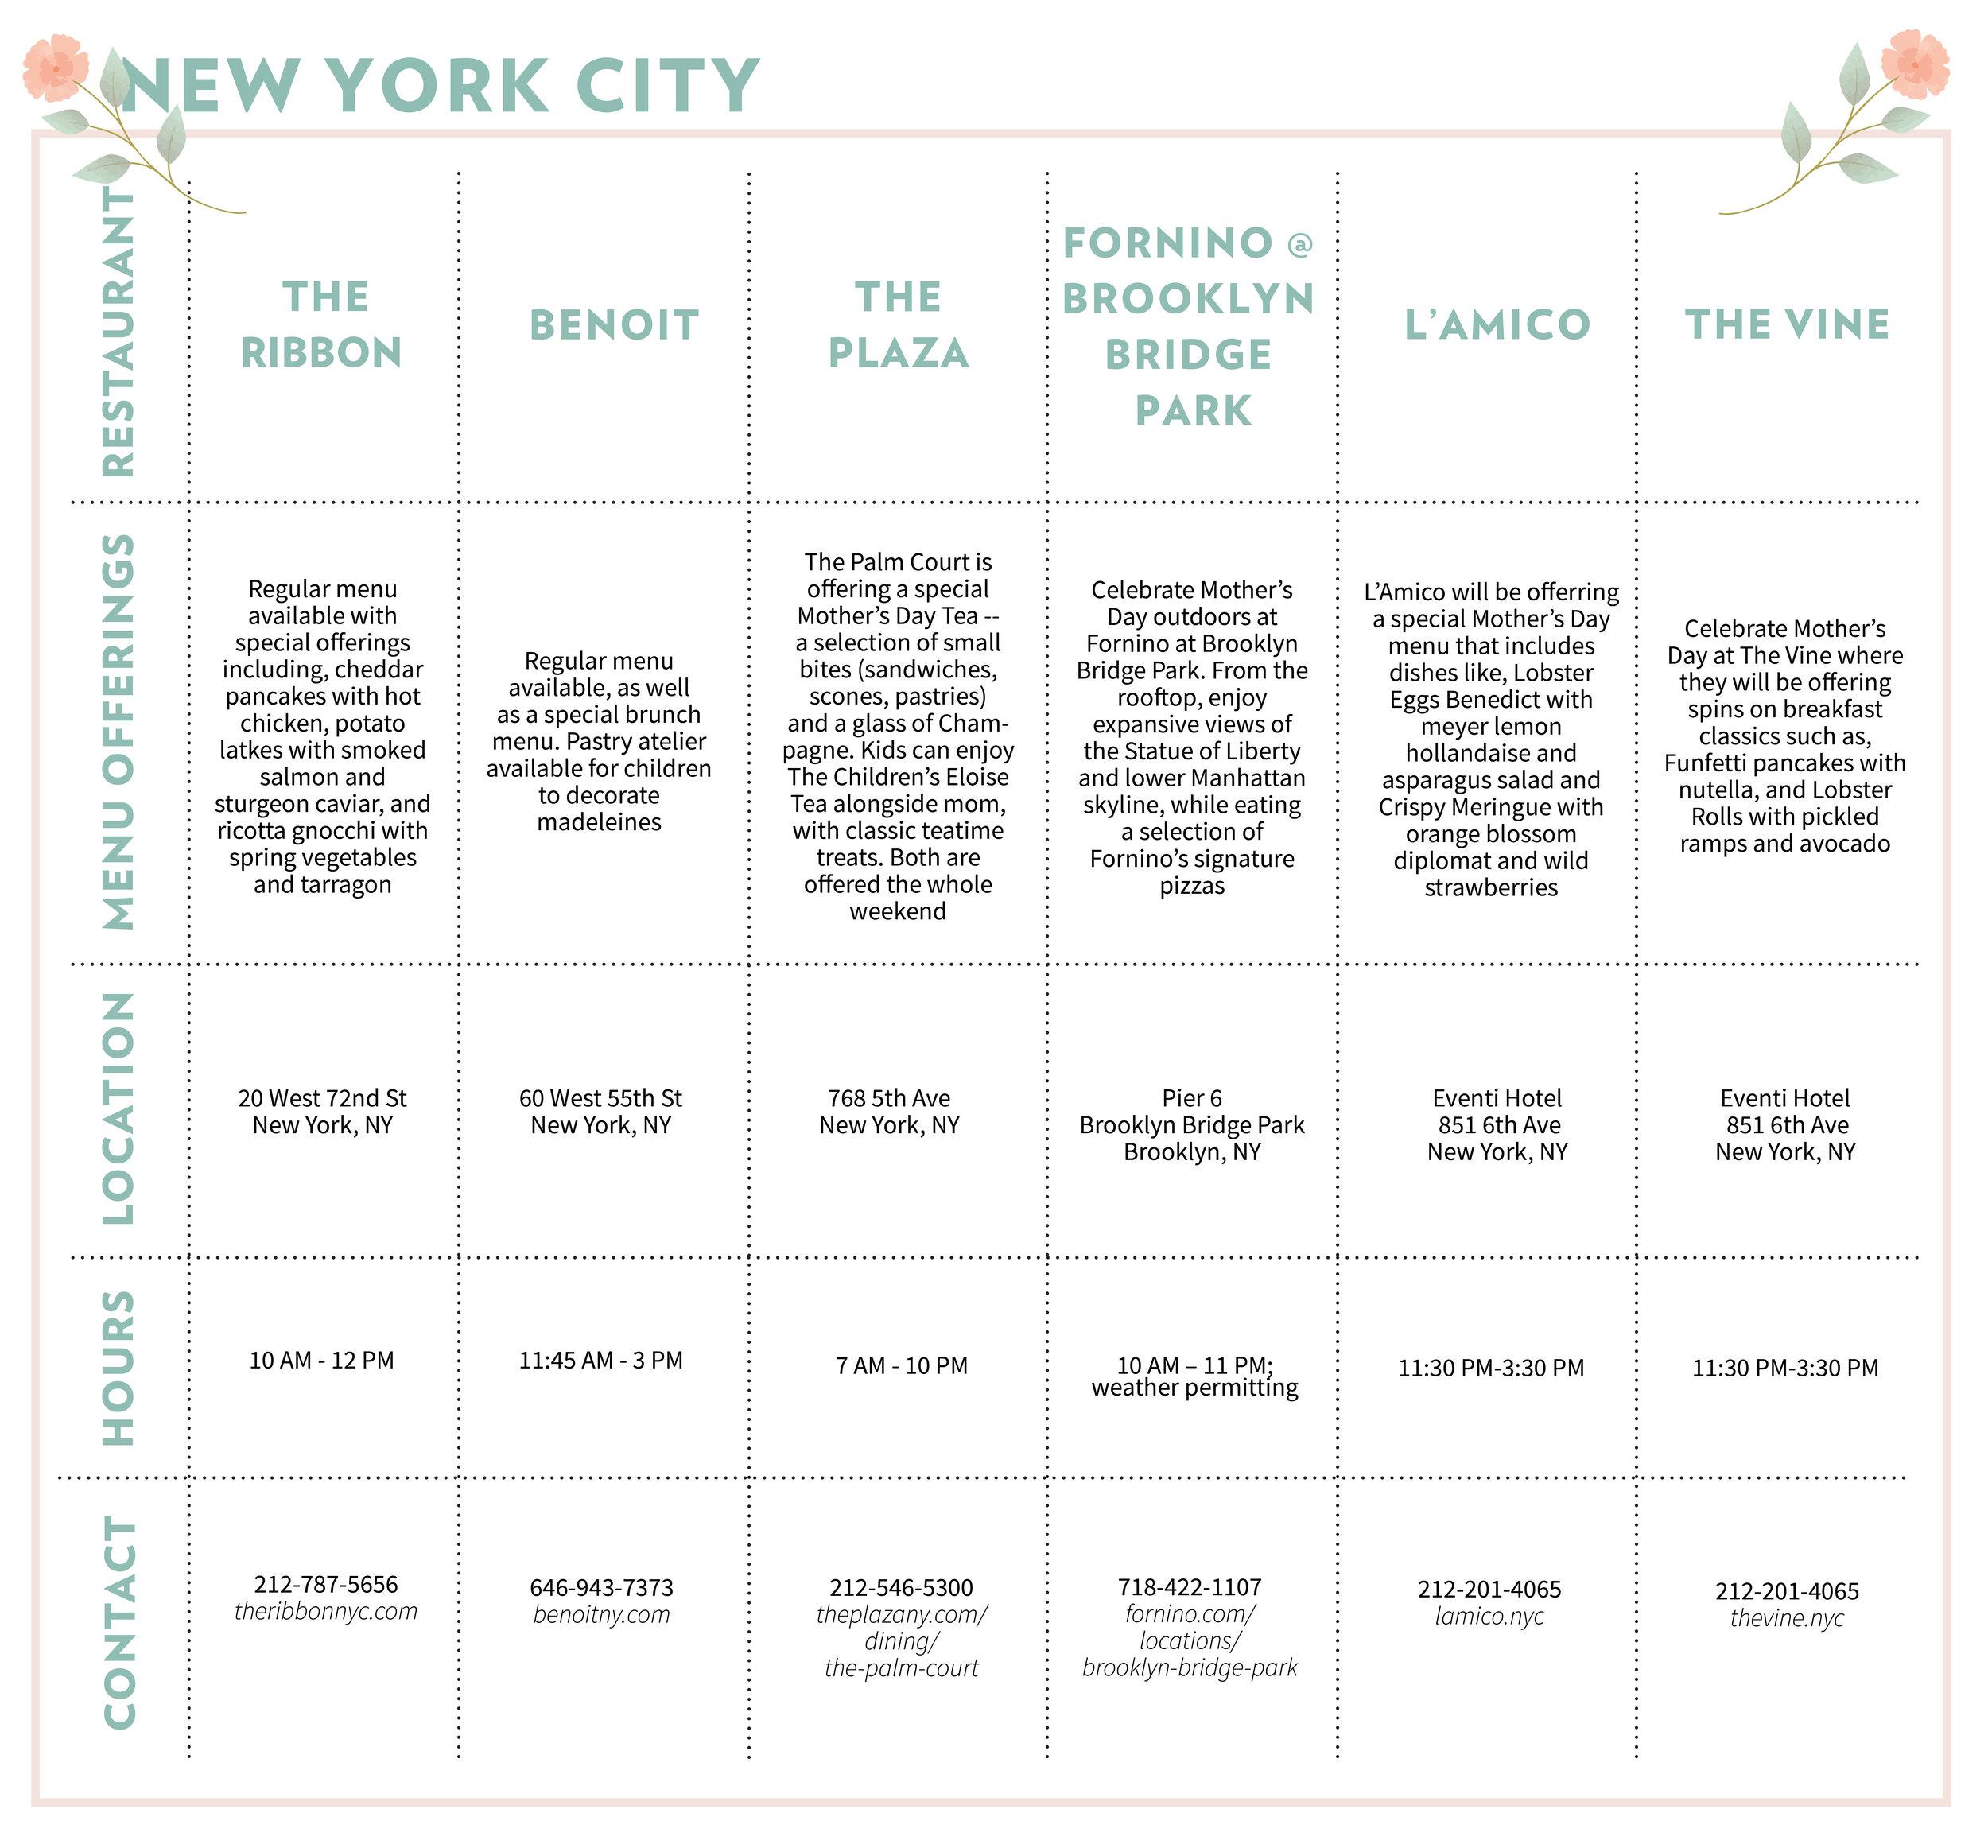 The Ribbon ,  Benoit ,  The Plaza ,  Fornino at Brooklyn Bridge Park ,  L'Amico ,  The Vine